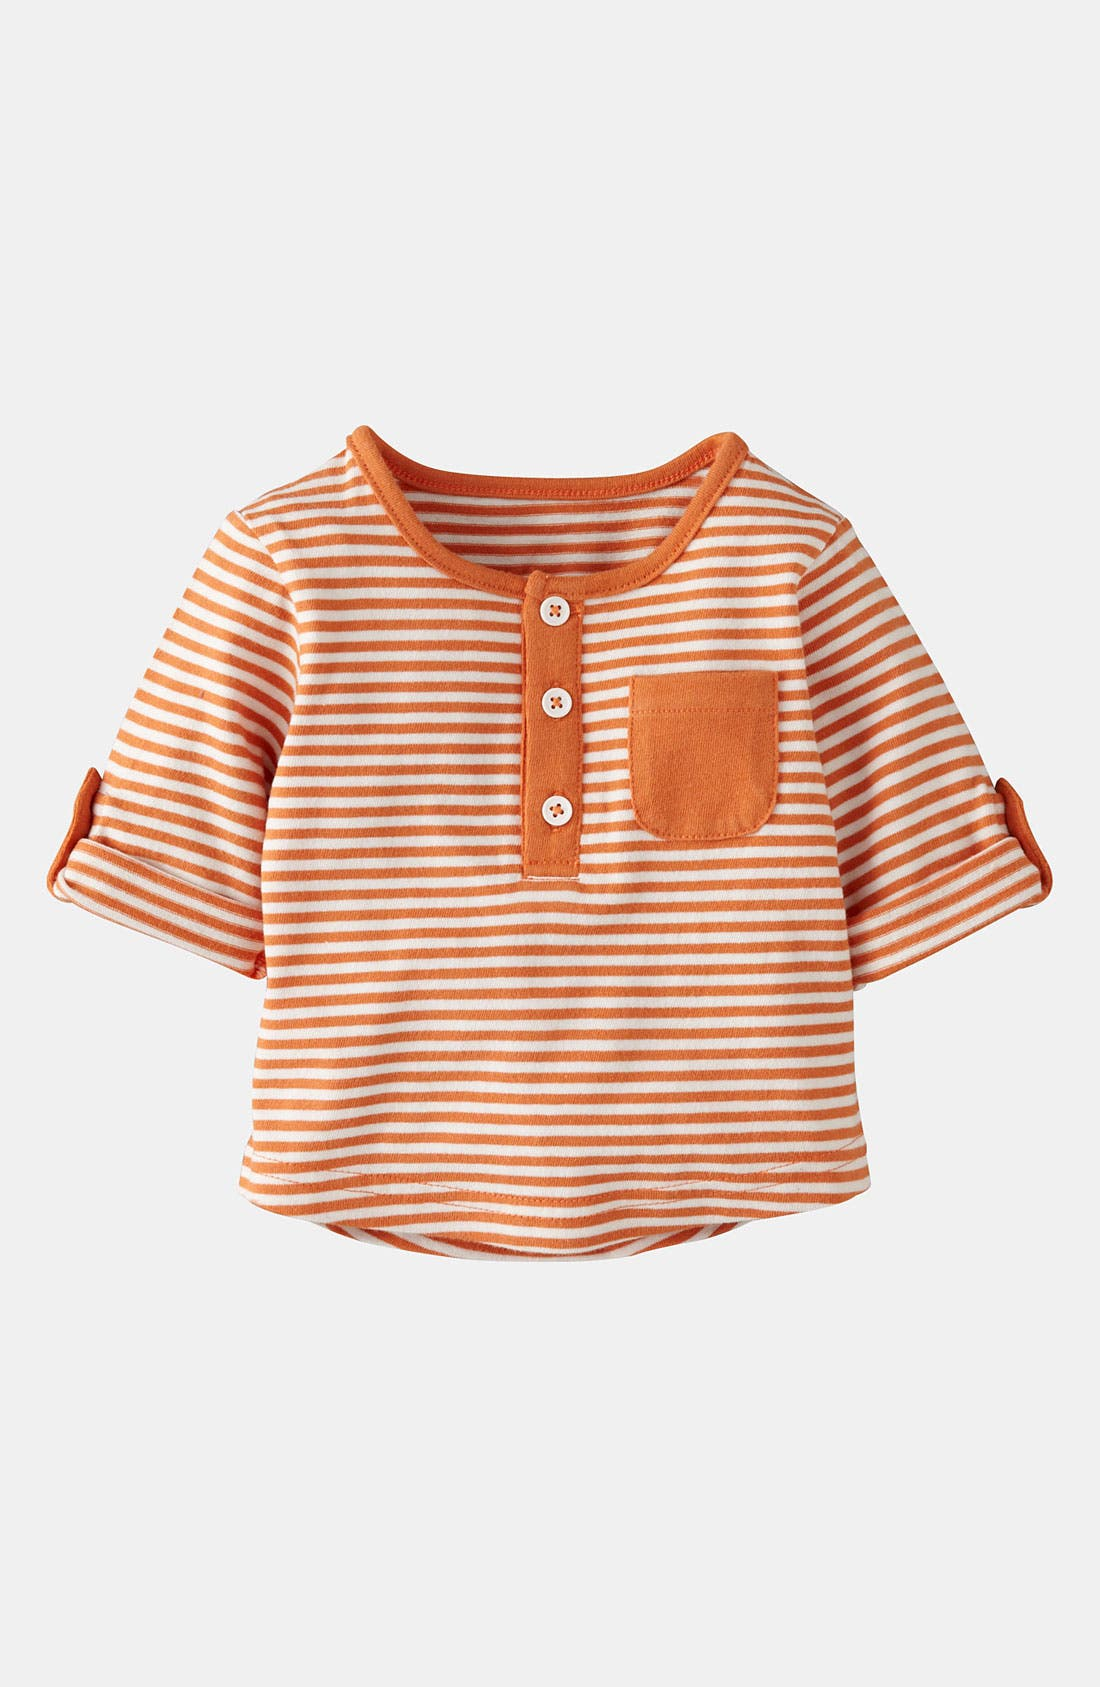 Alternate Image 1 Selected - Mini Boden Henley Shirt (Baby)